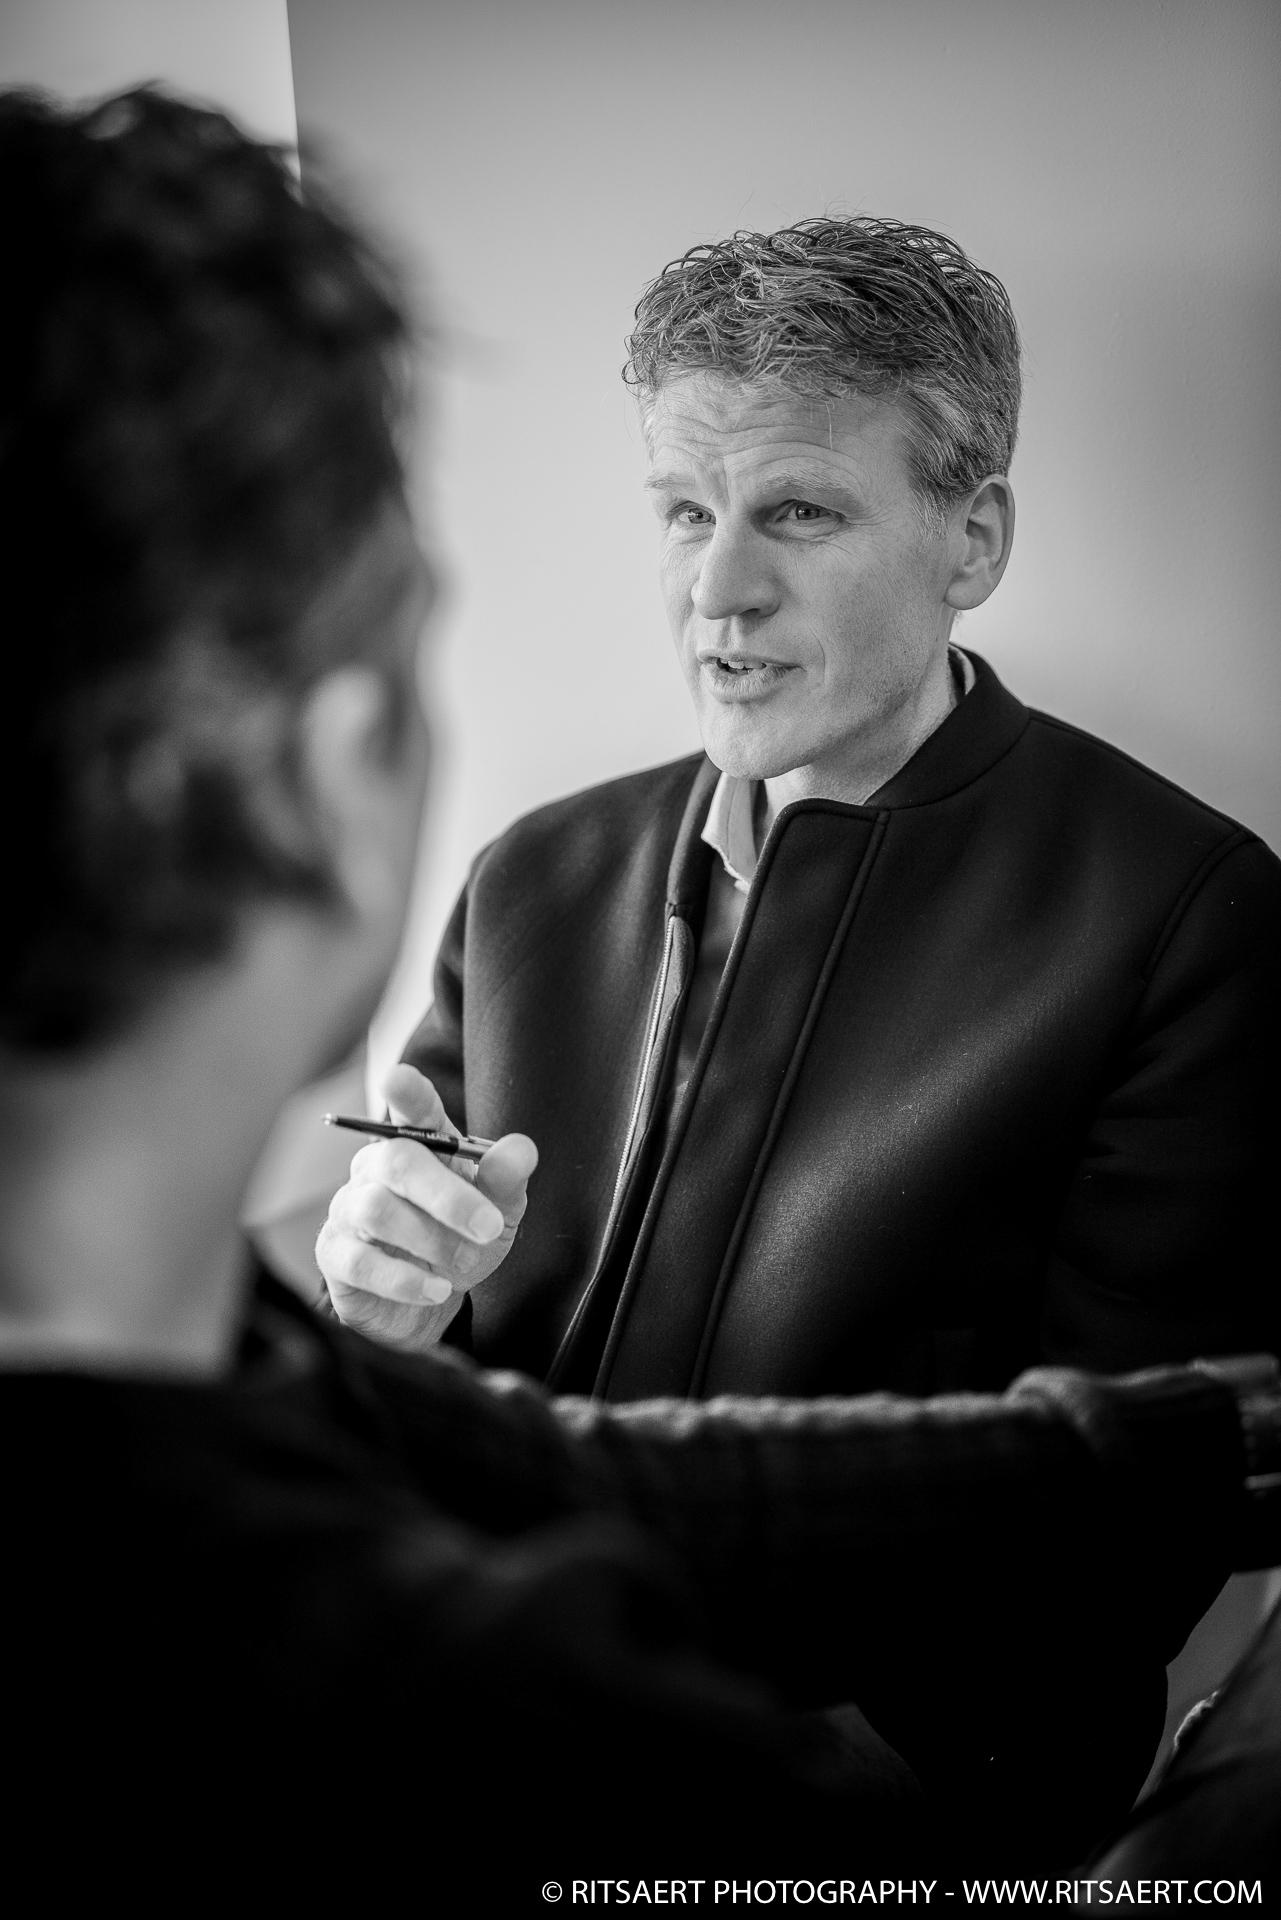 Hugo Logtenberg - Research reporter & writer - Amsterdam